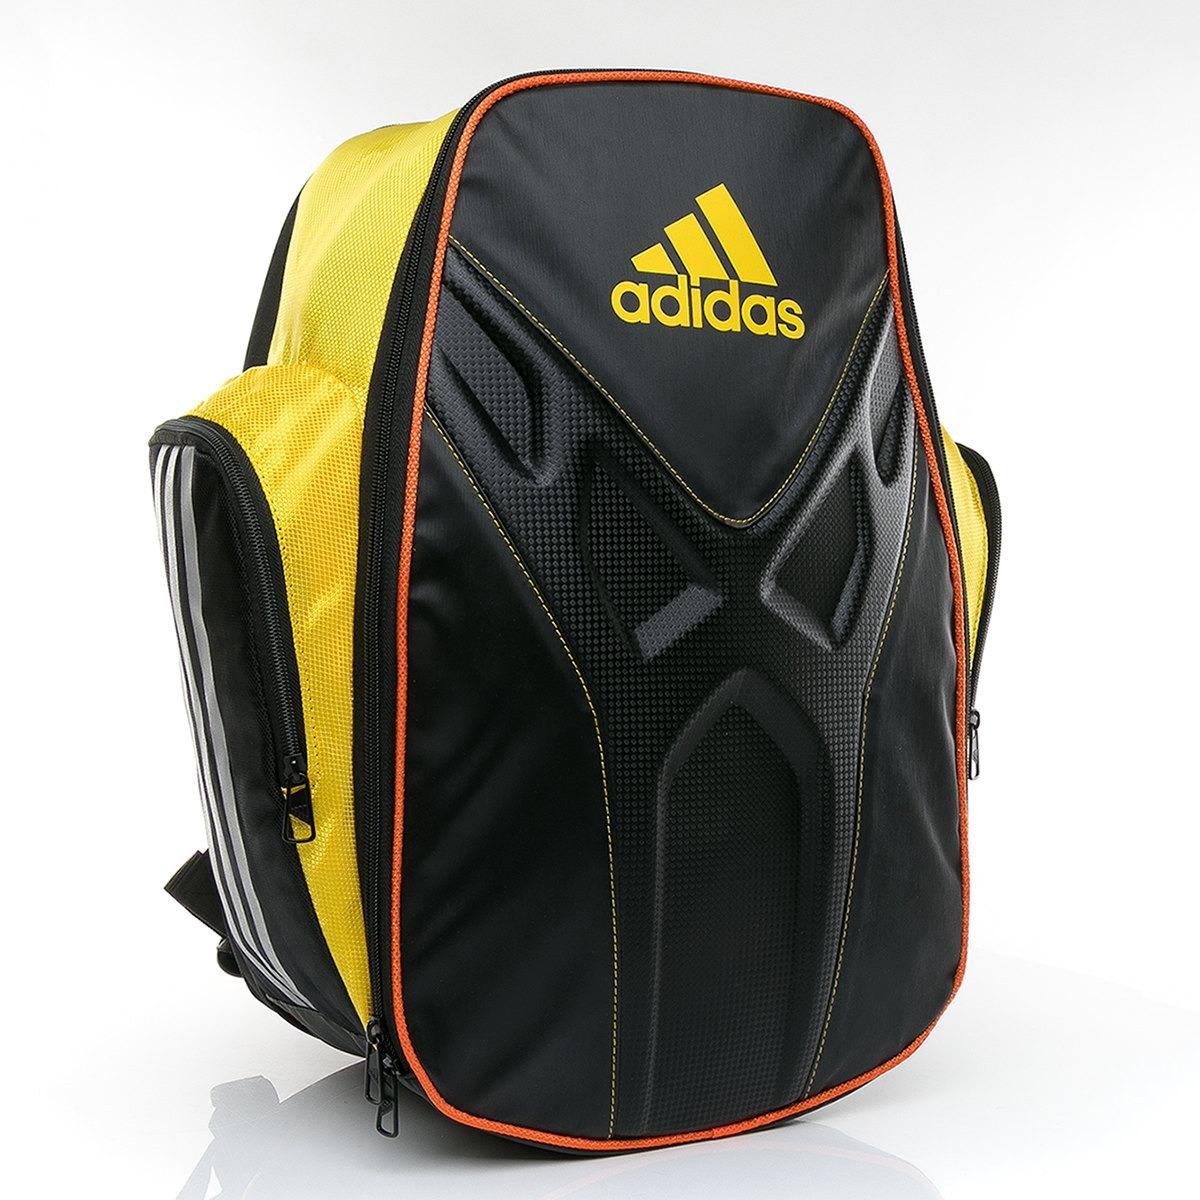 574d5508d Attak Mochila Adidas Adipower Sport 1 7 Padel 78 kXuTwilOZP